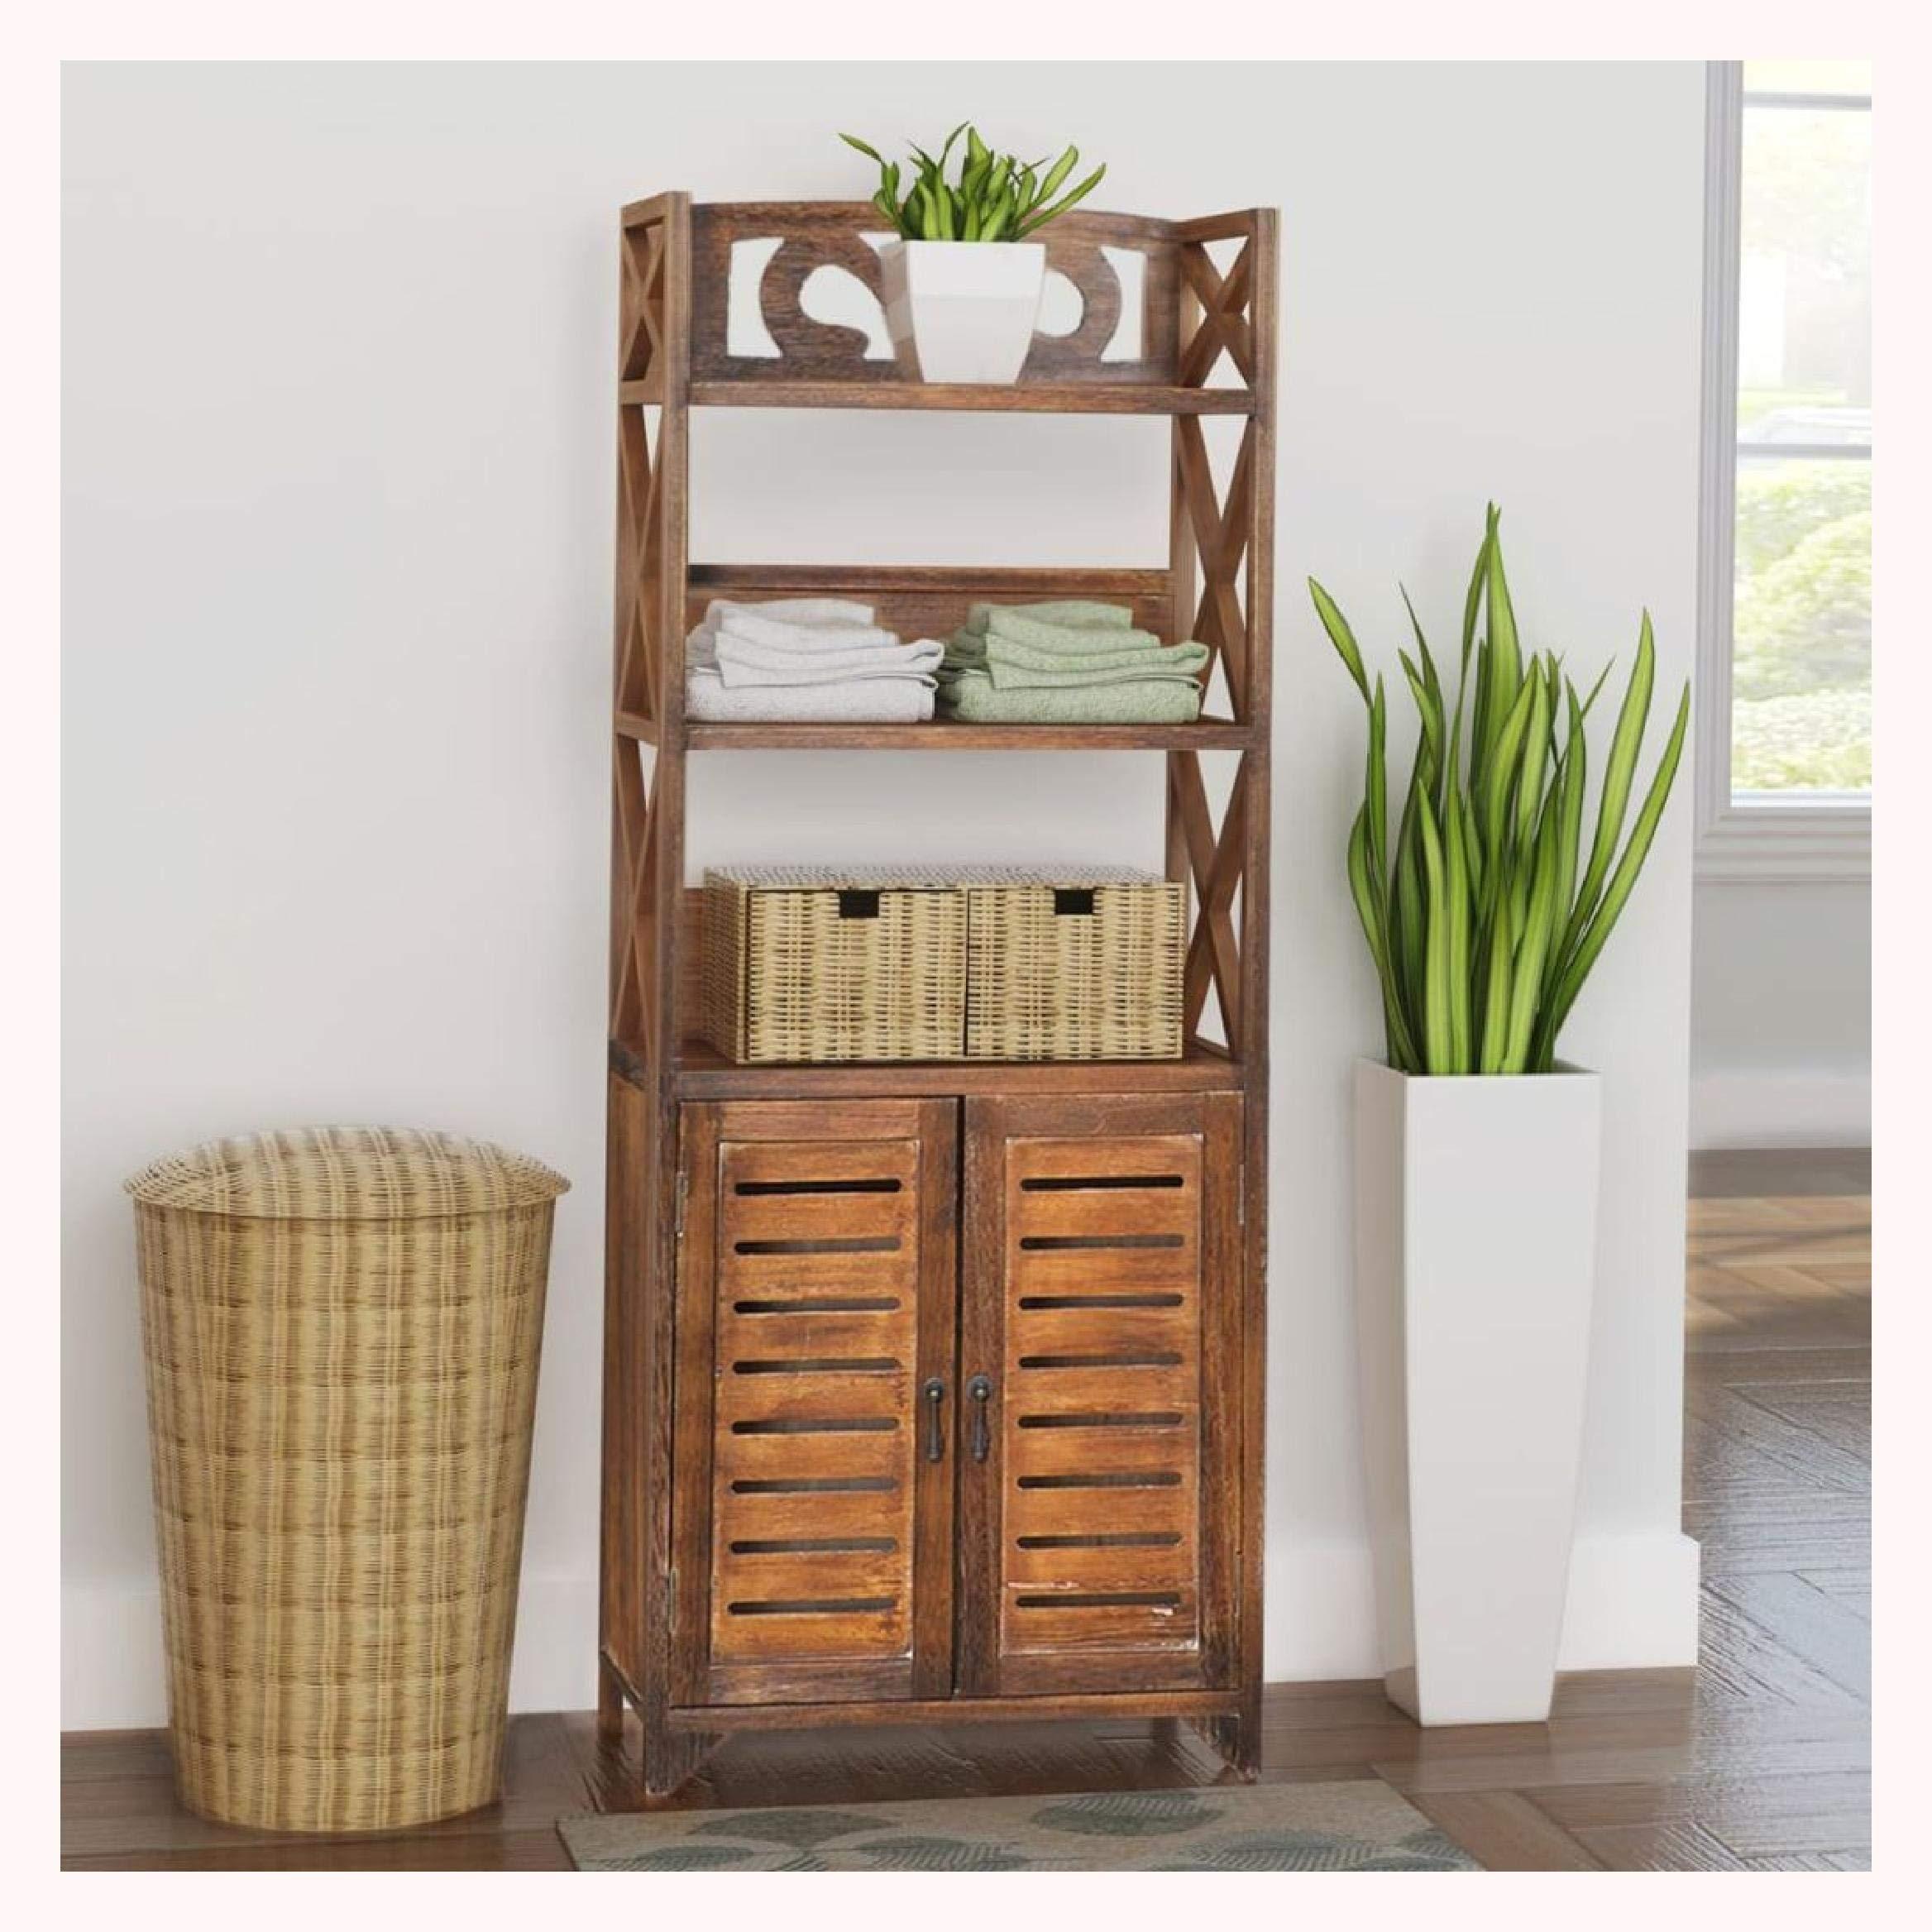 K&A Company Bathroom Cabinet Albuquerque Wood Brown 18''x9.4''x46.3''